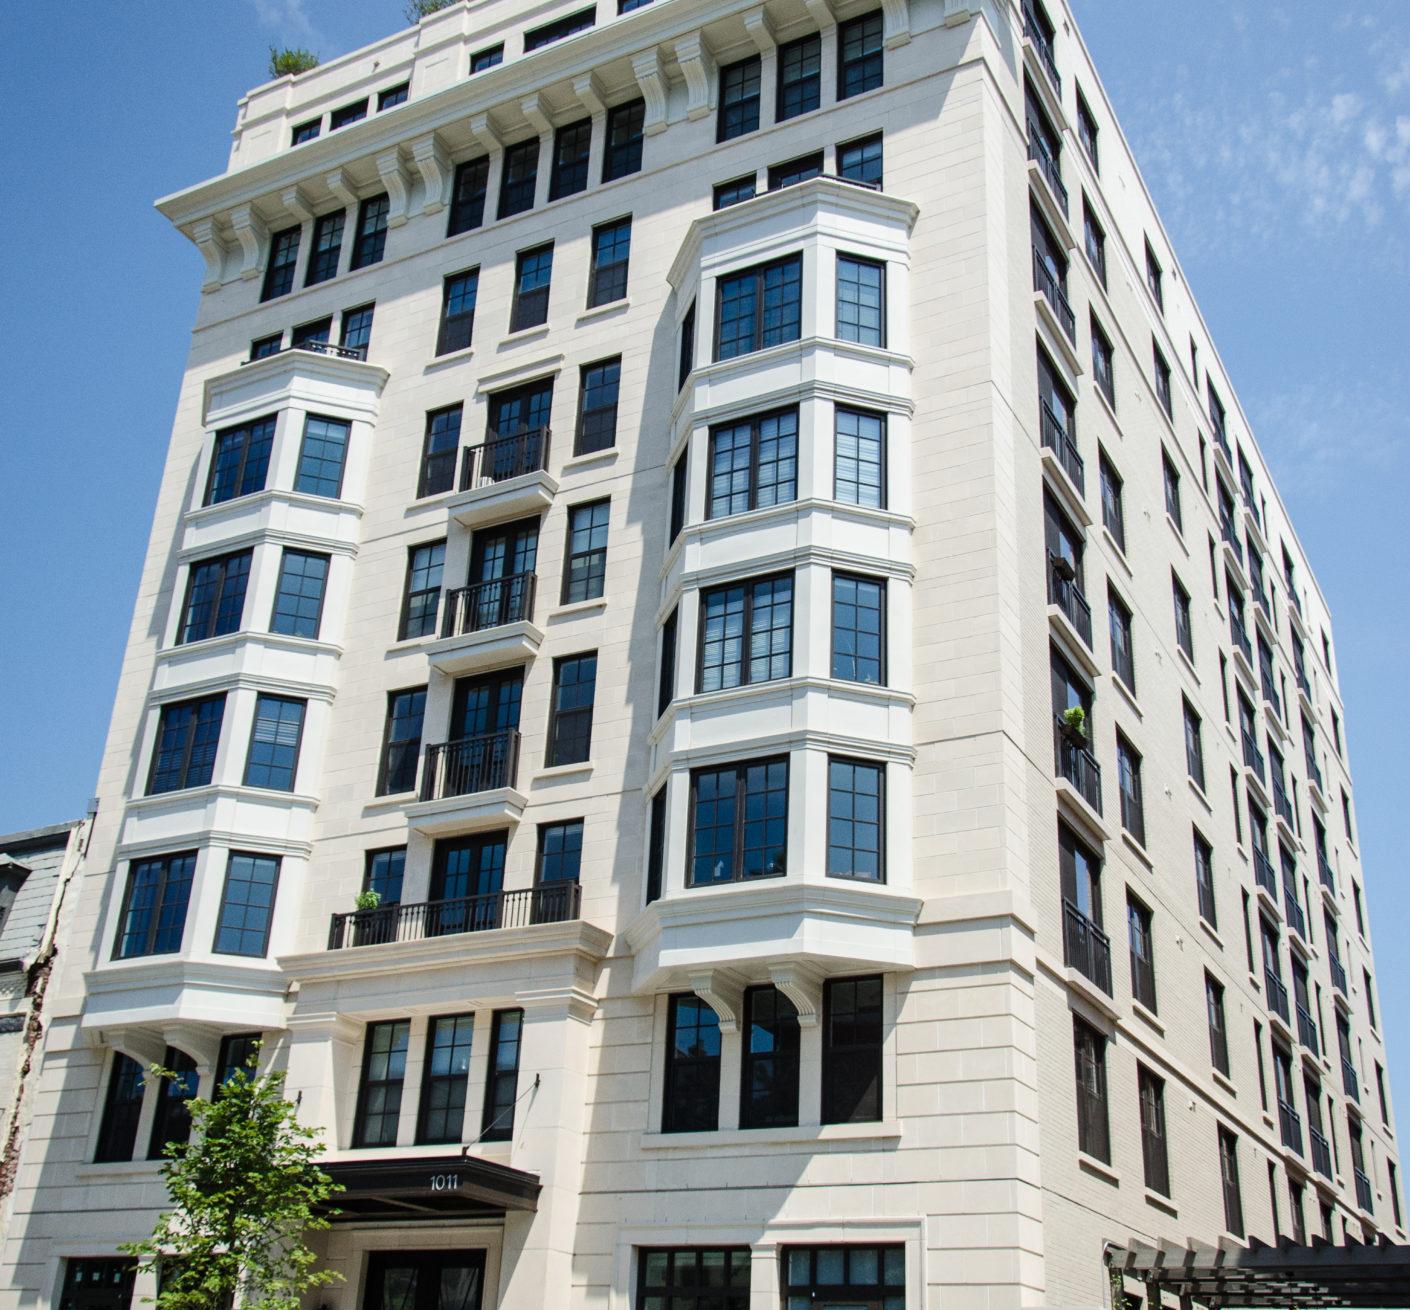 1011 M Street - Washington - 2